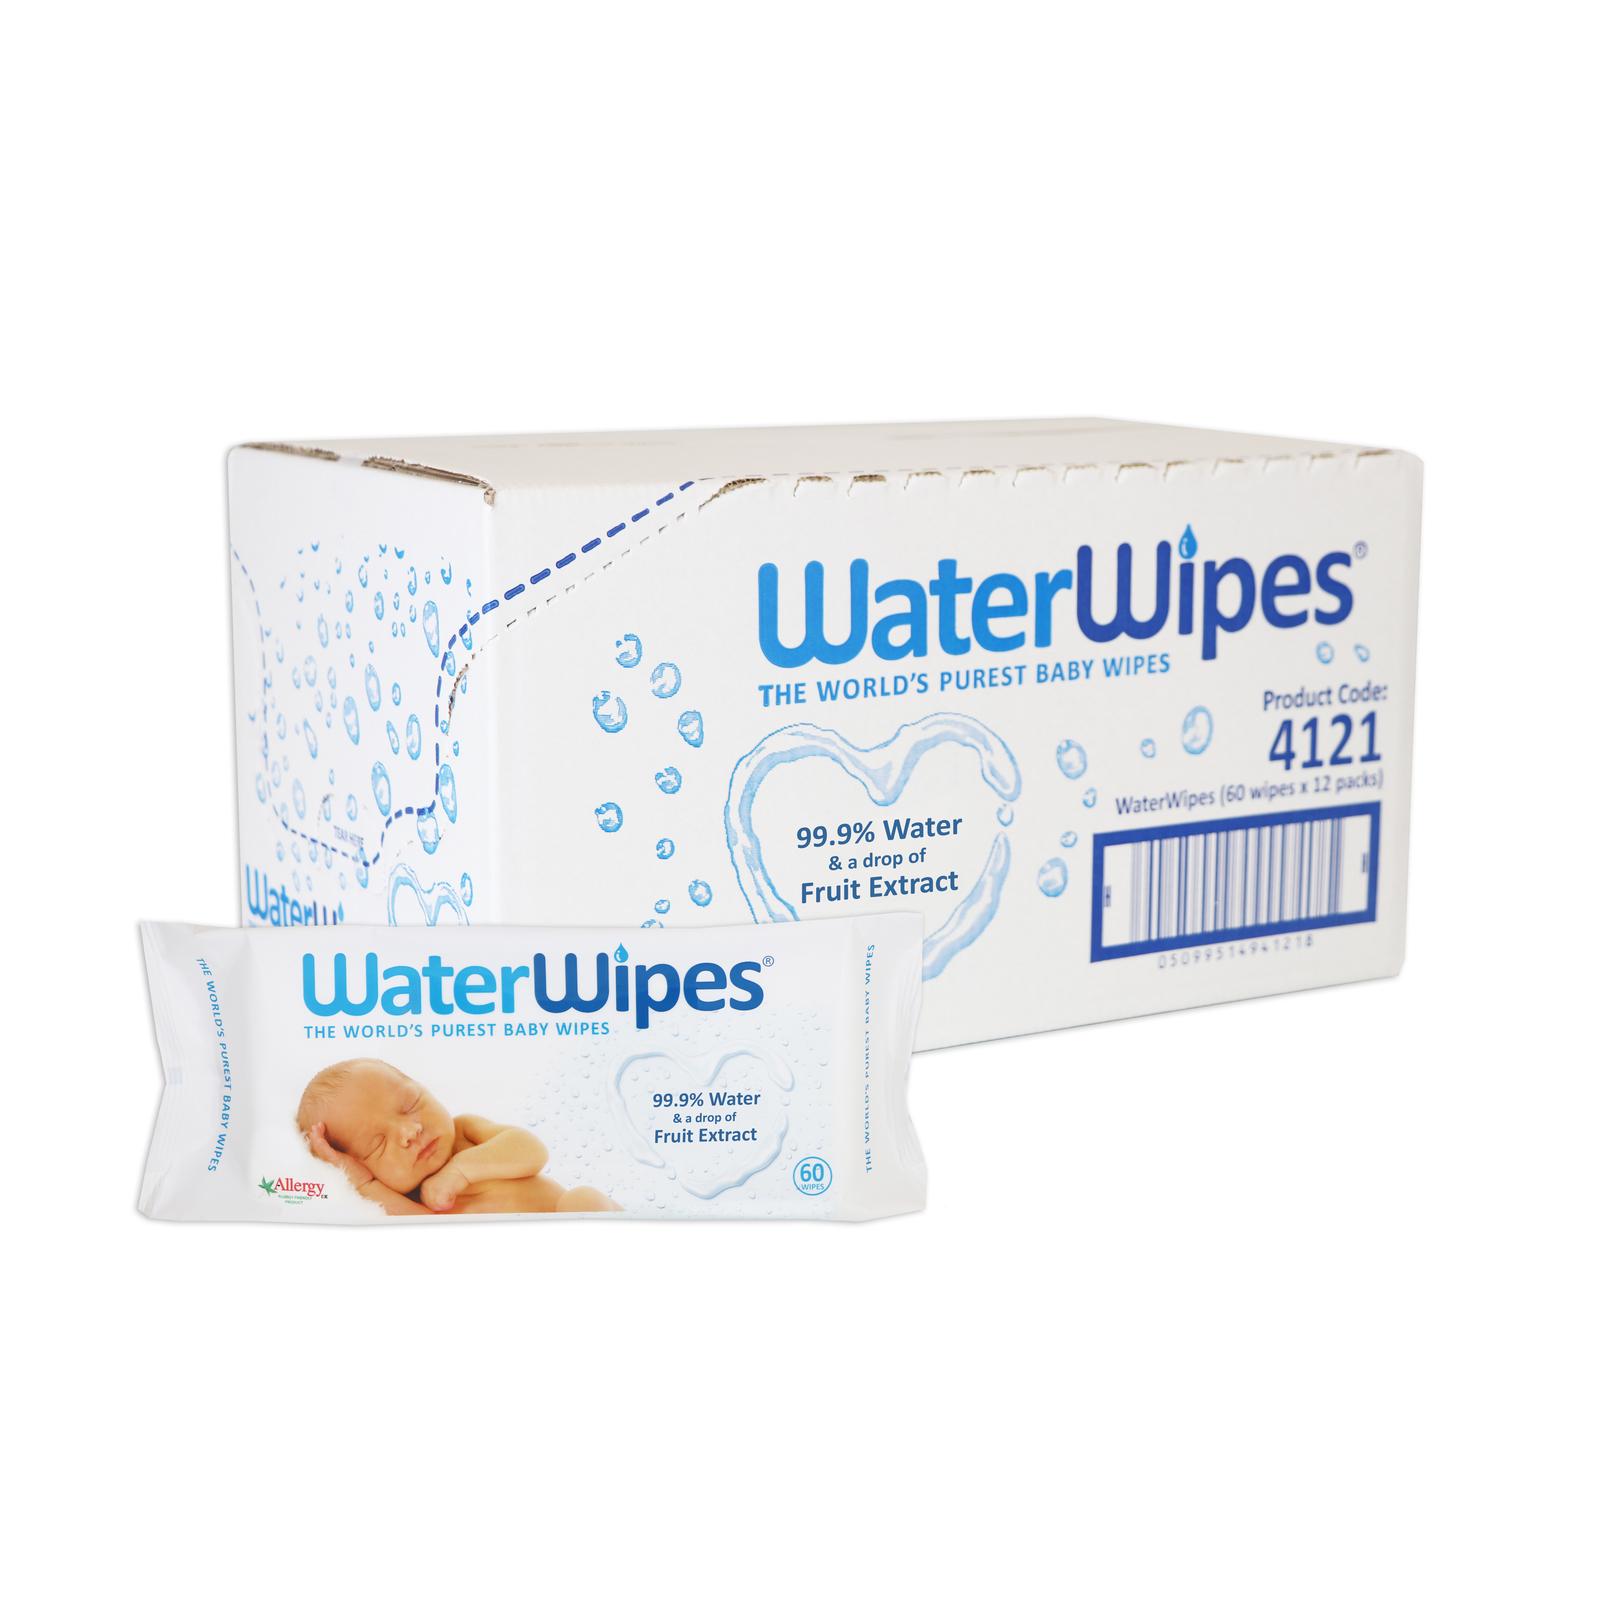 WaterWipes 12pk Box (720 Wipes) image